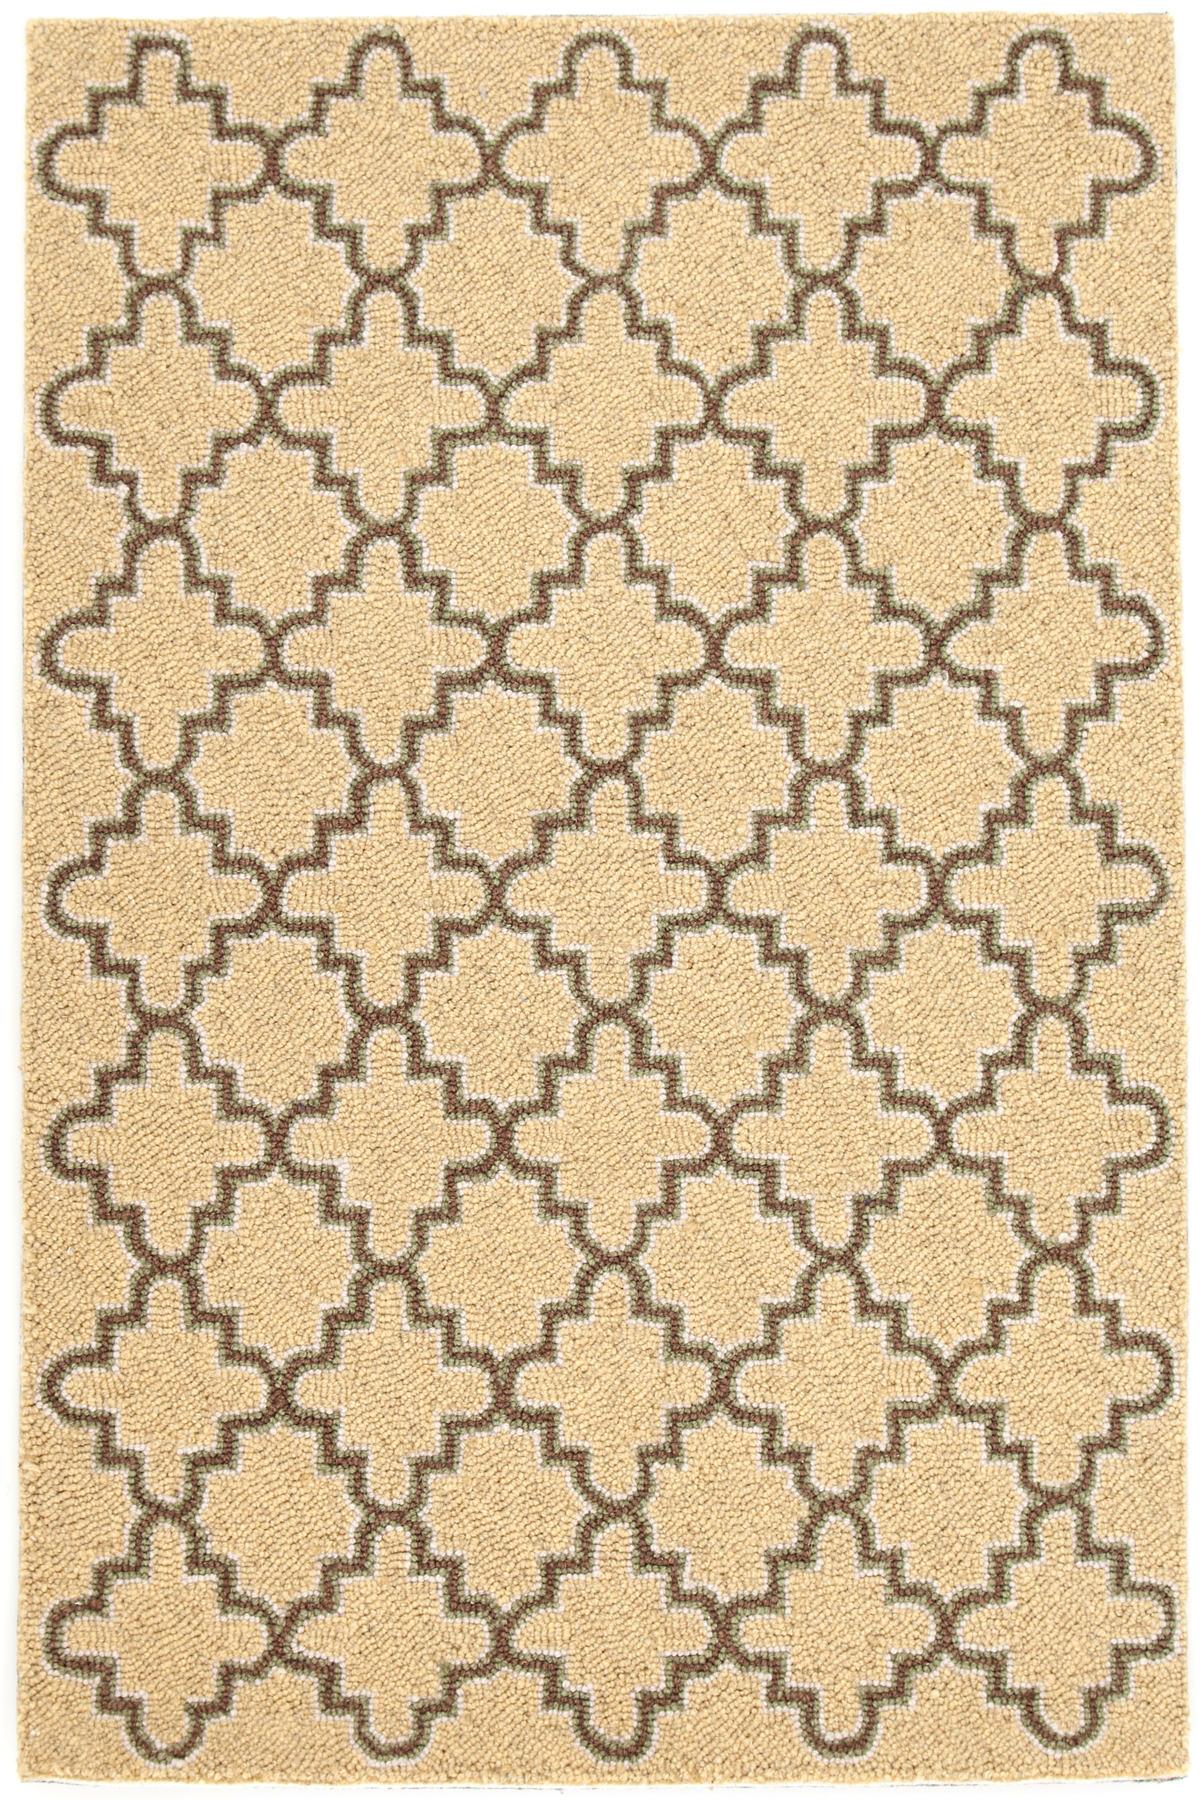 Plain Tin Wheat Wool Micro Hooked Rug